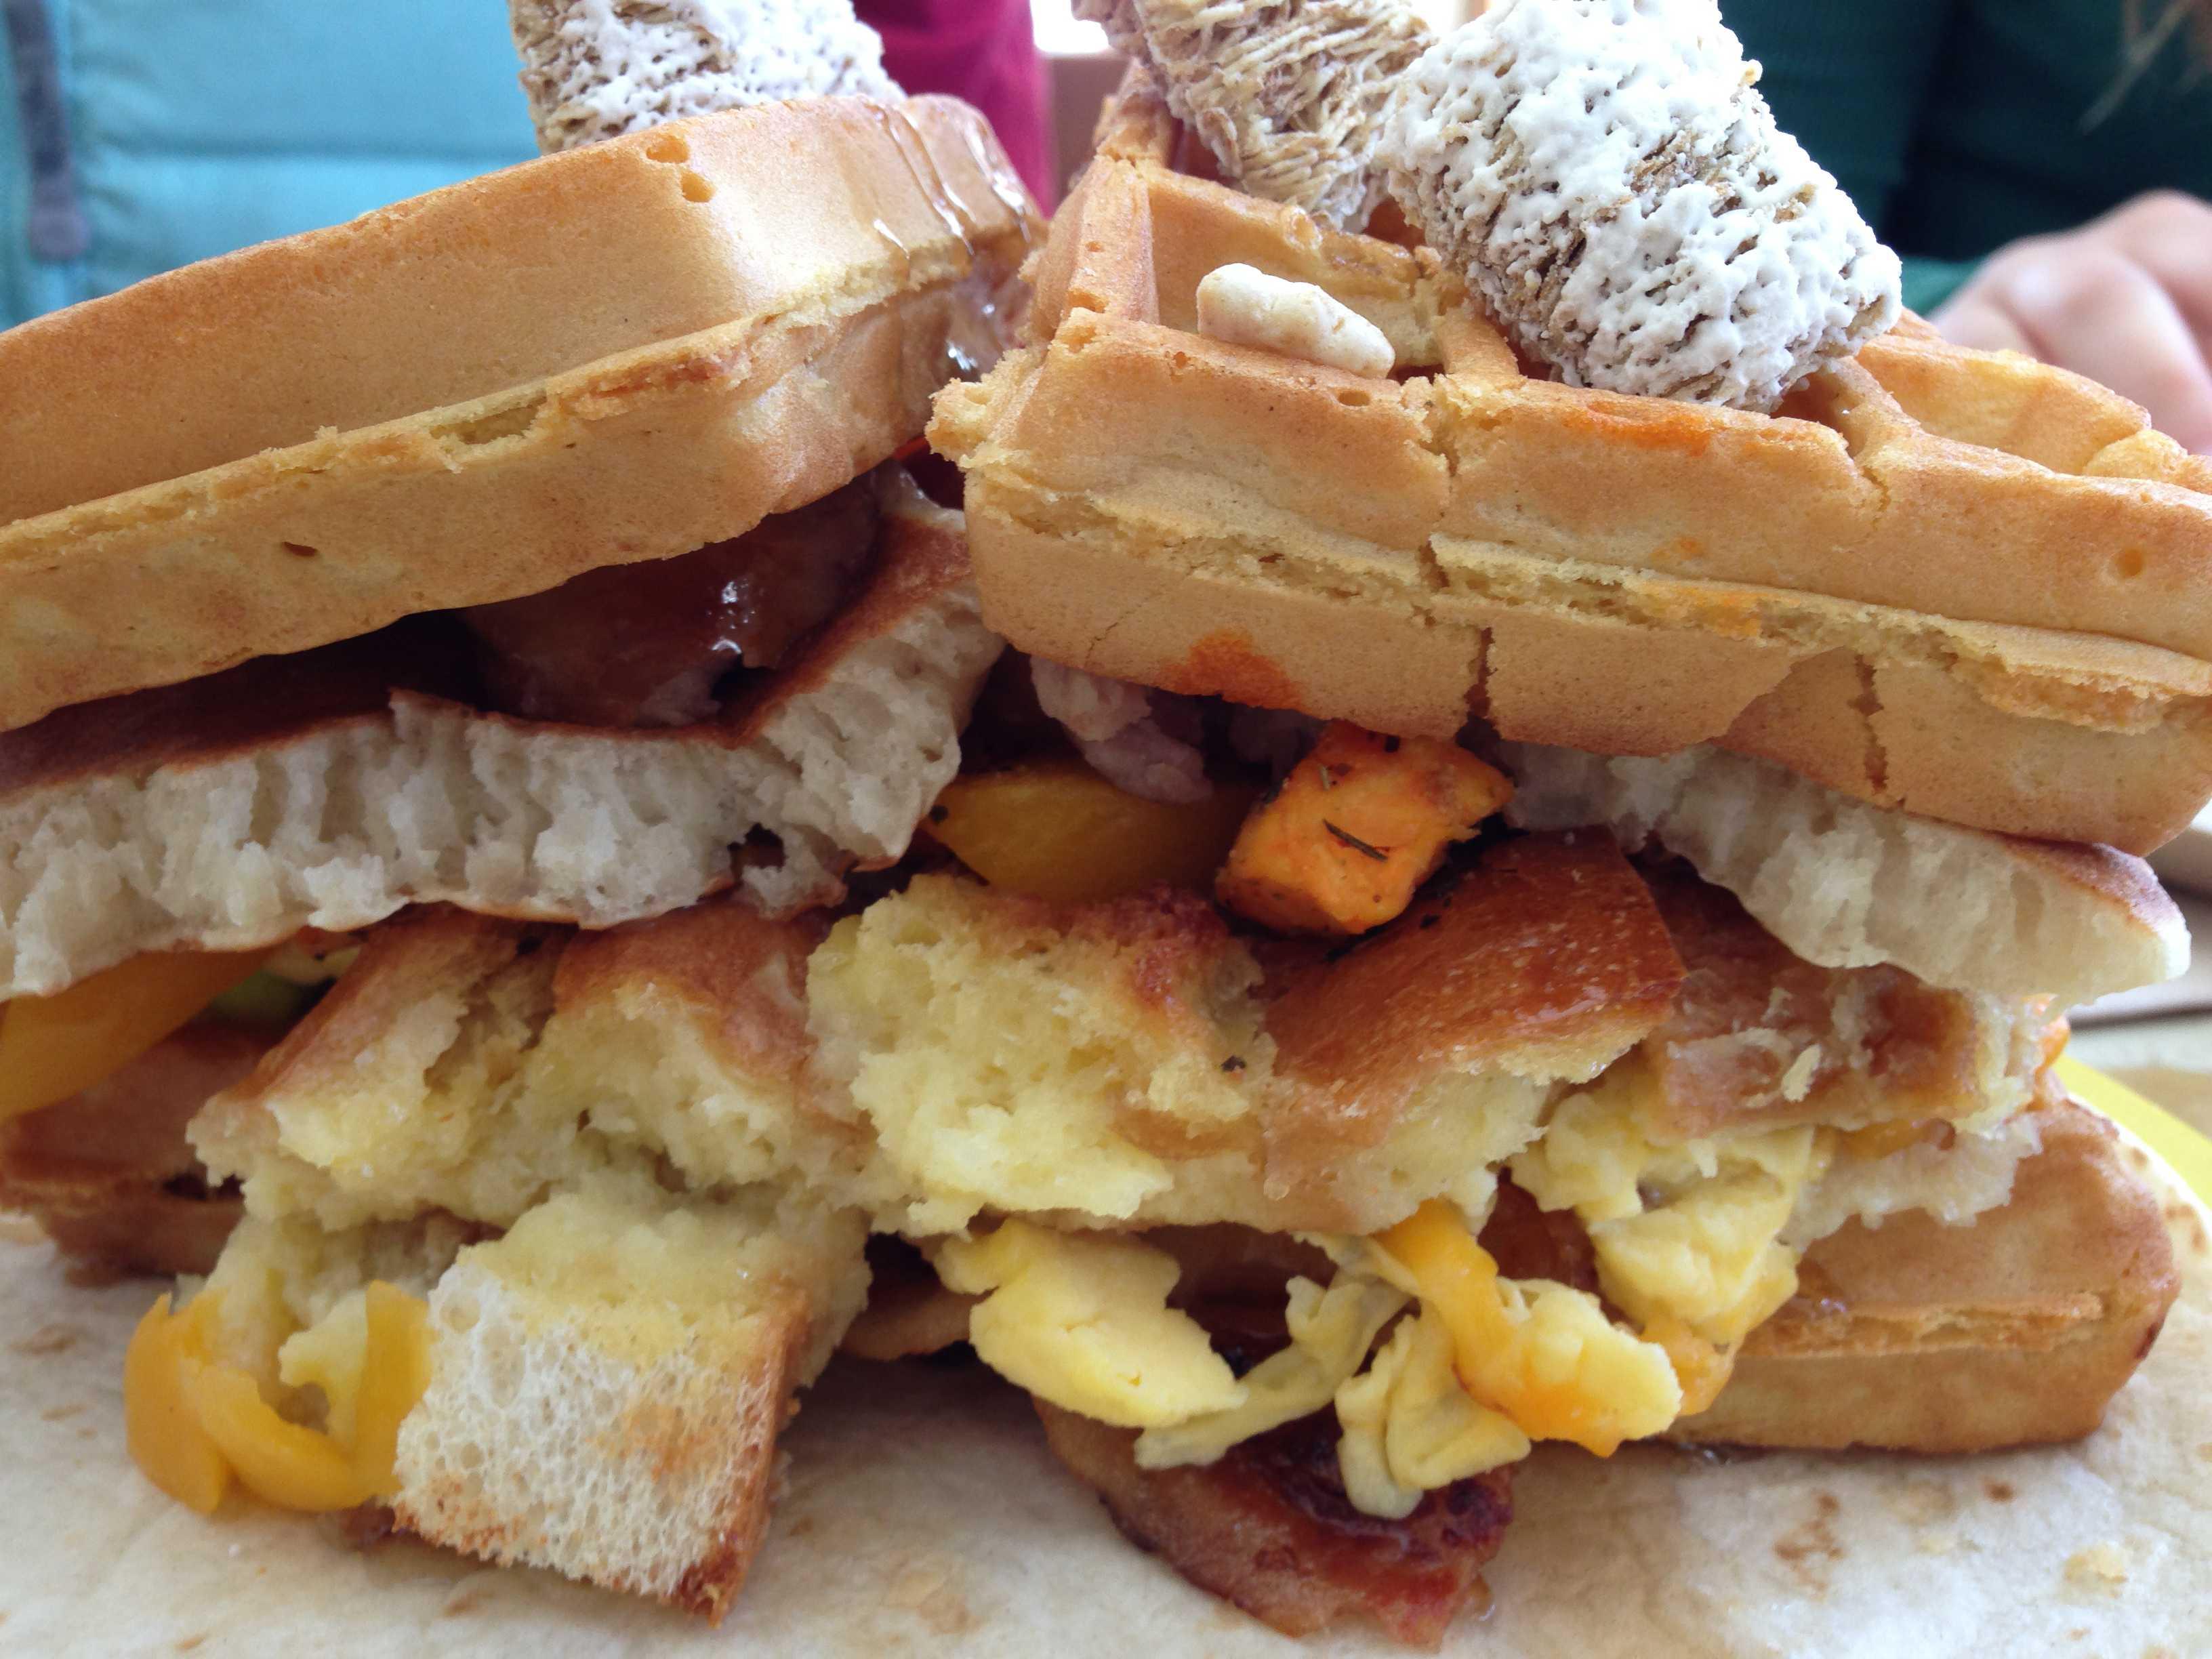 'Wichcraft: a satirical sandwich review